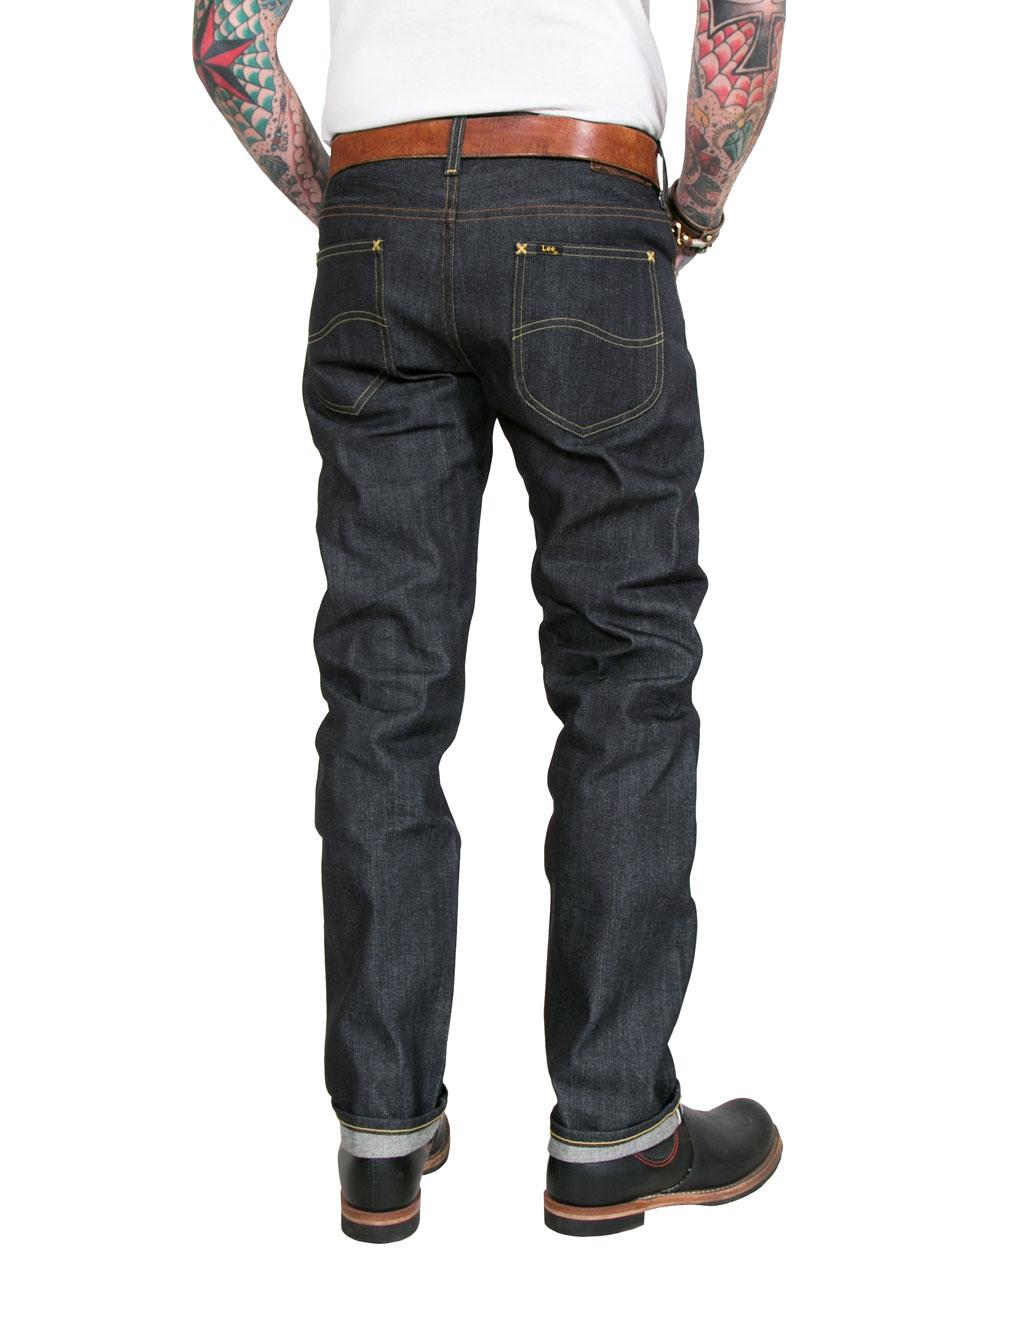 9fb0a16e Lee - 101 S Regular Fit Raw Jeans - Dry Selvage Denim - 13 3/4oz - Blu